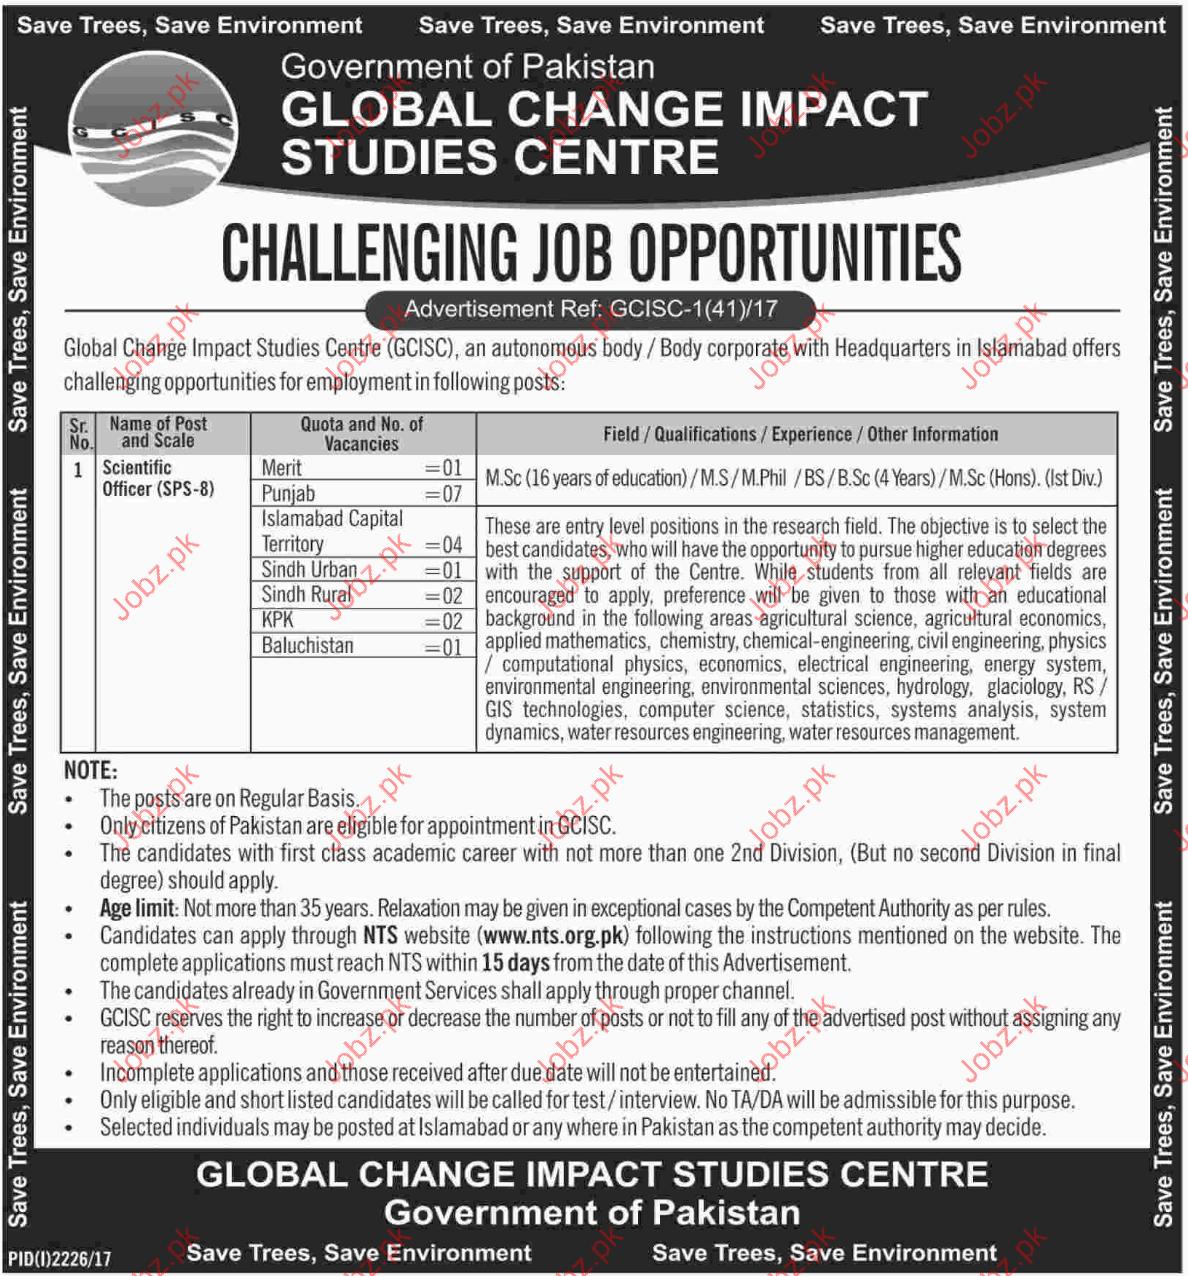 Global Change Impact Studies Center Jobs Opportunity